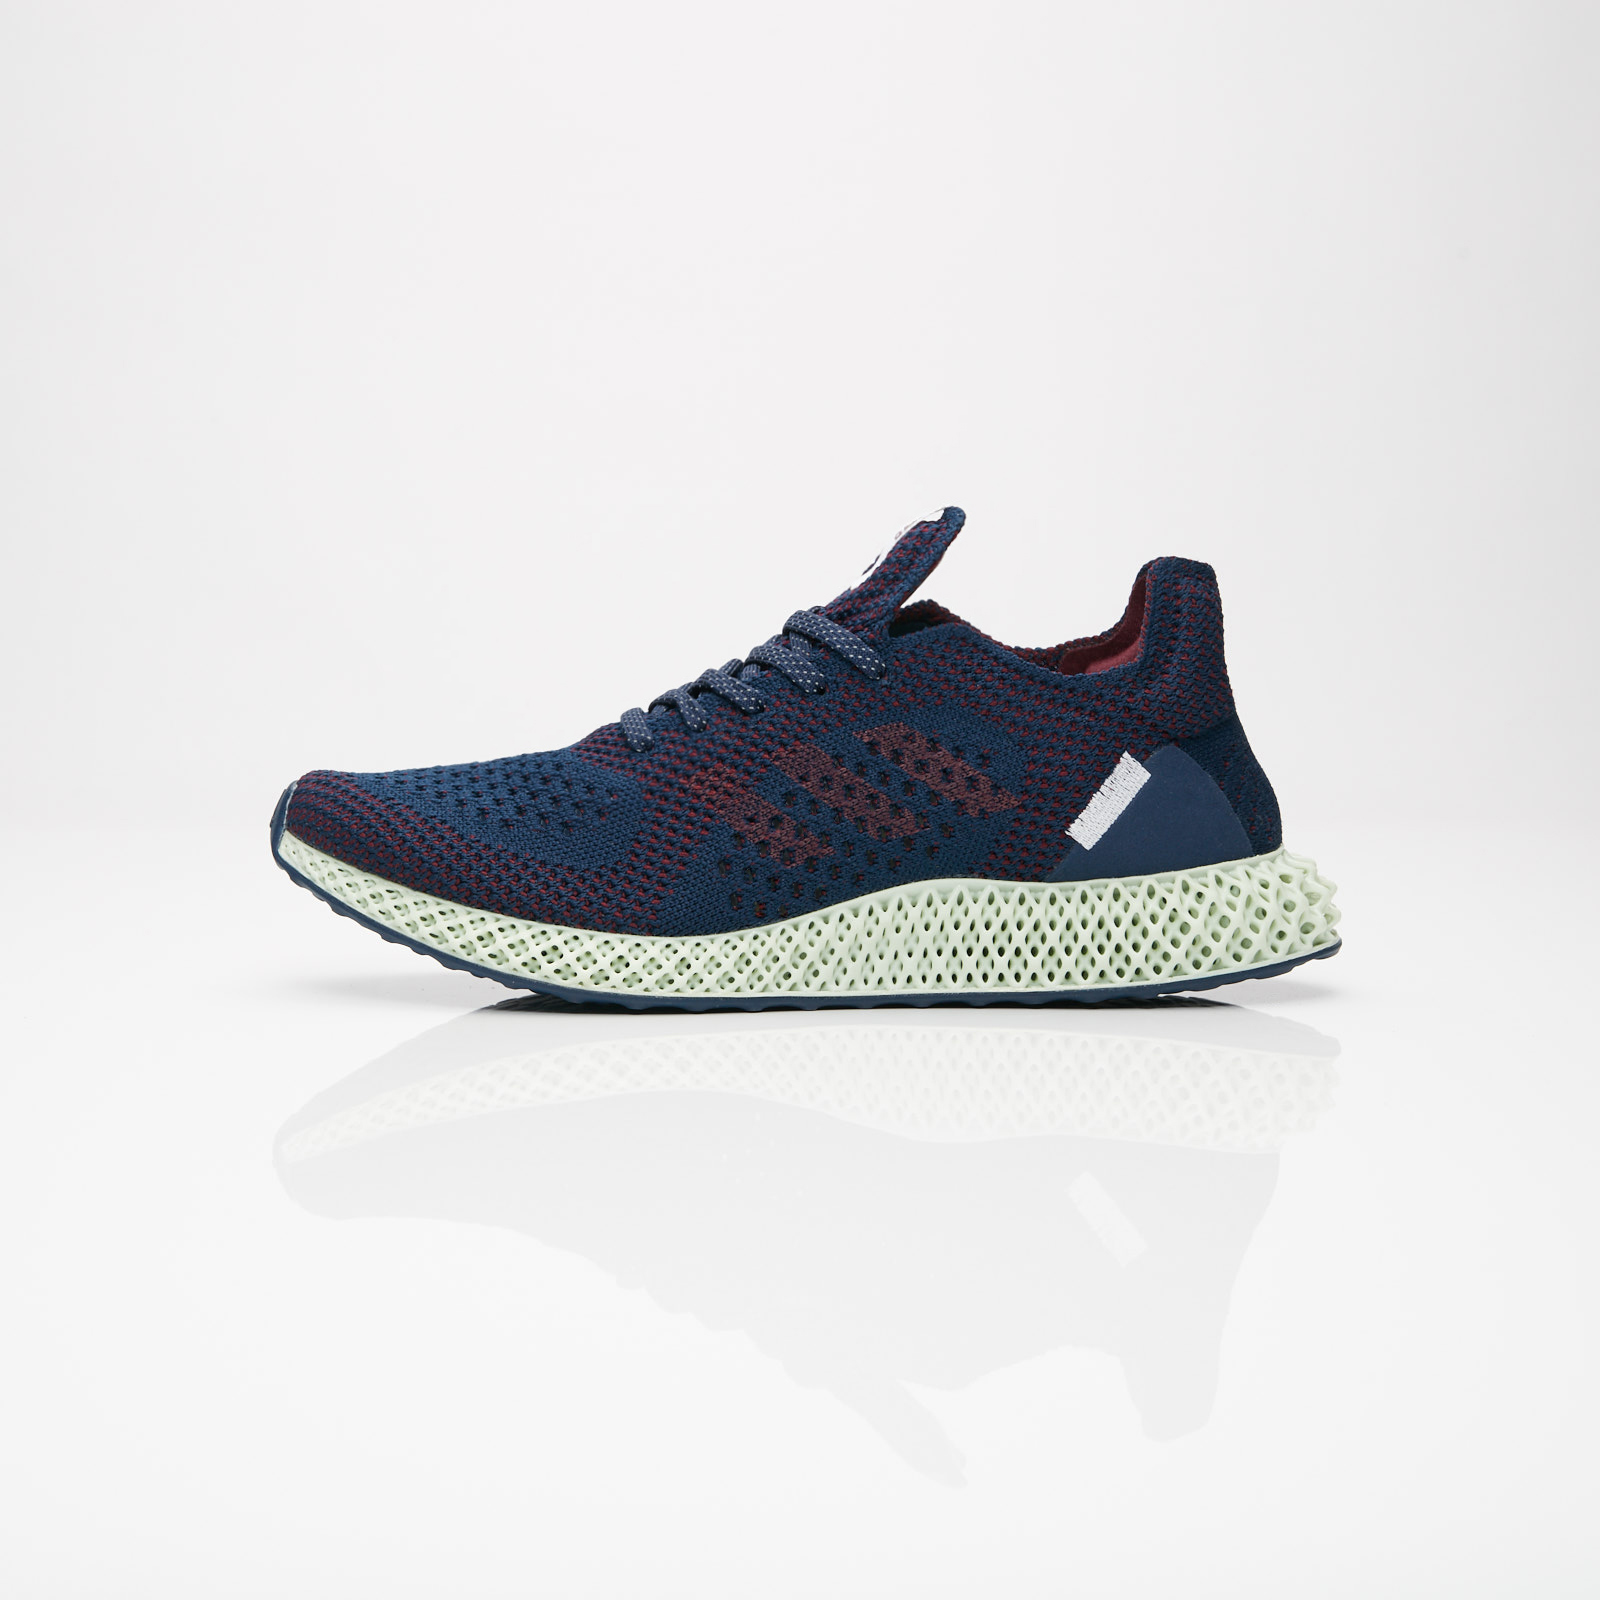 Adidas FutureCraft 4D Sneakersnstuff Consortium Runner SNS